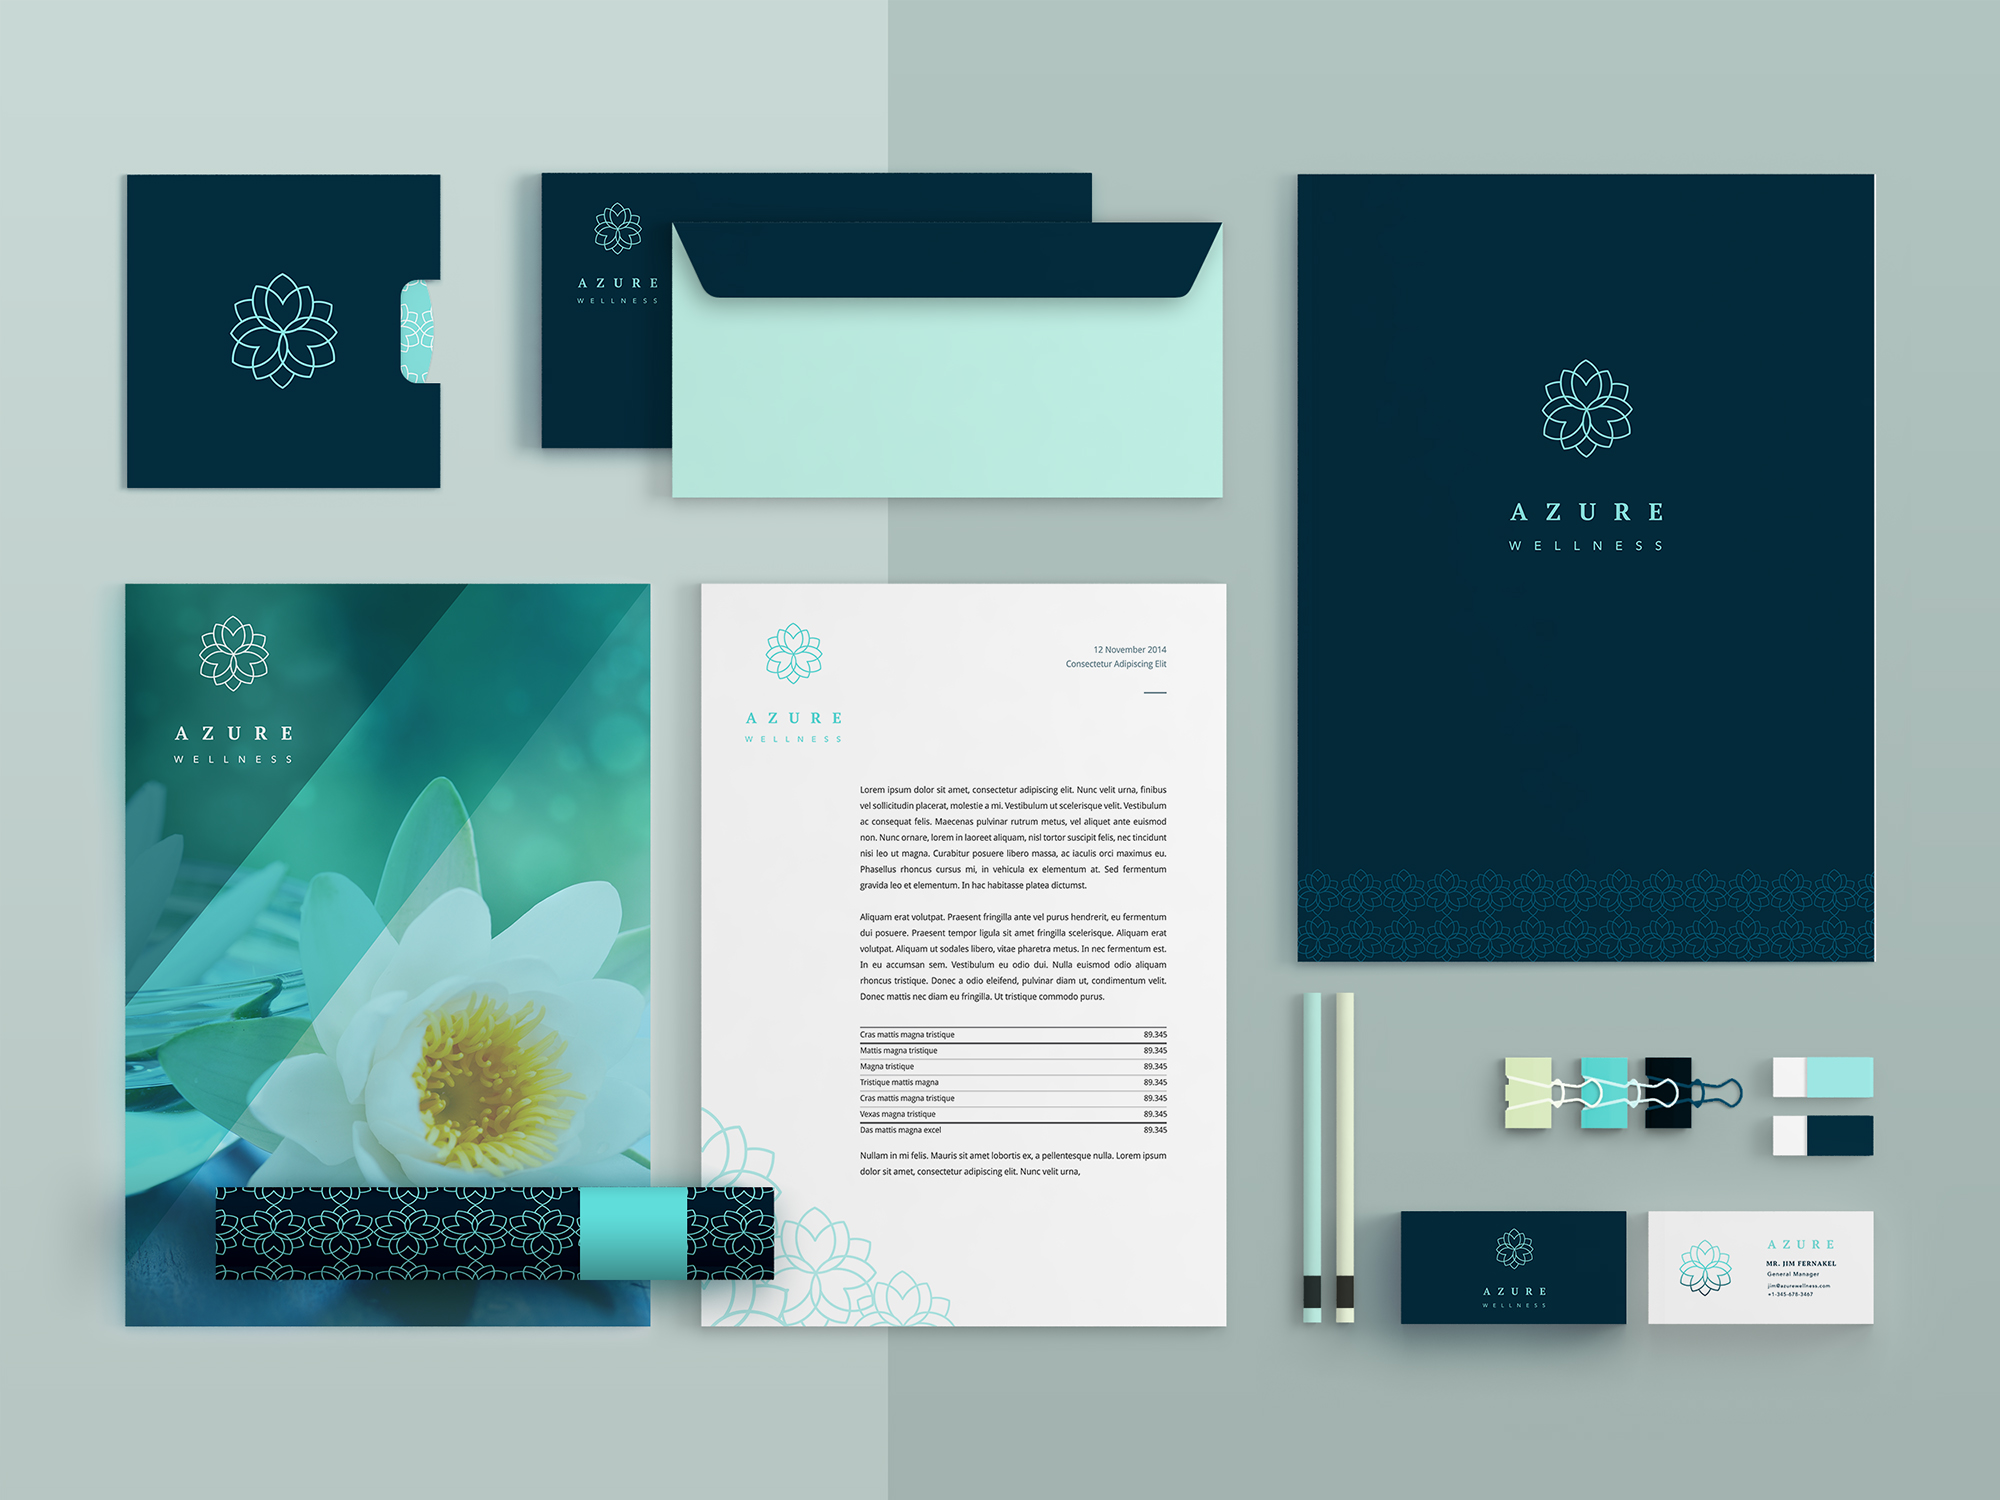 Azure Brand Identity